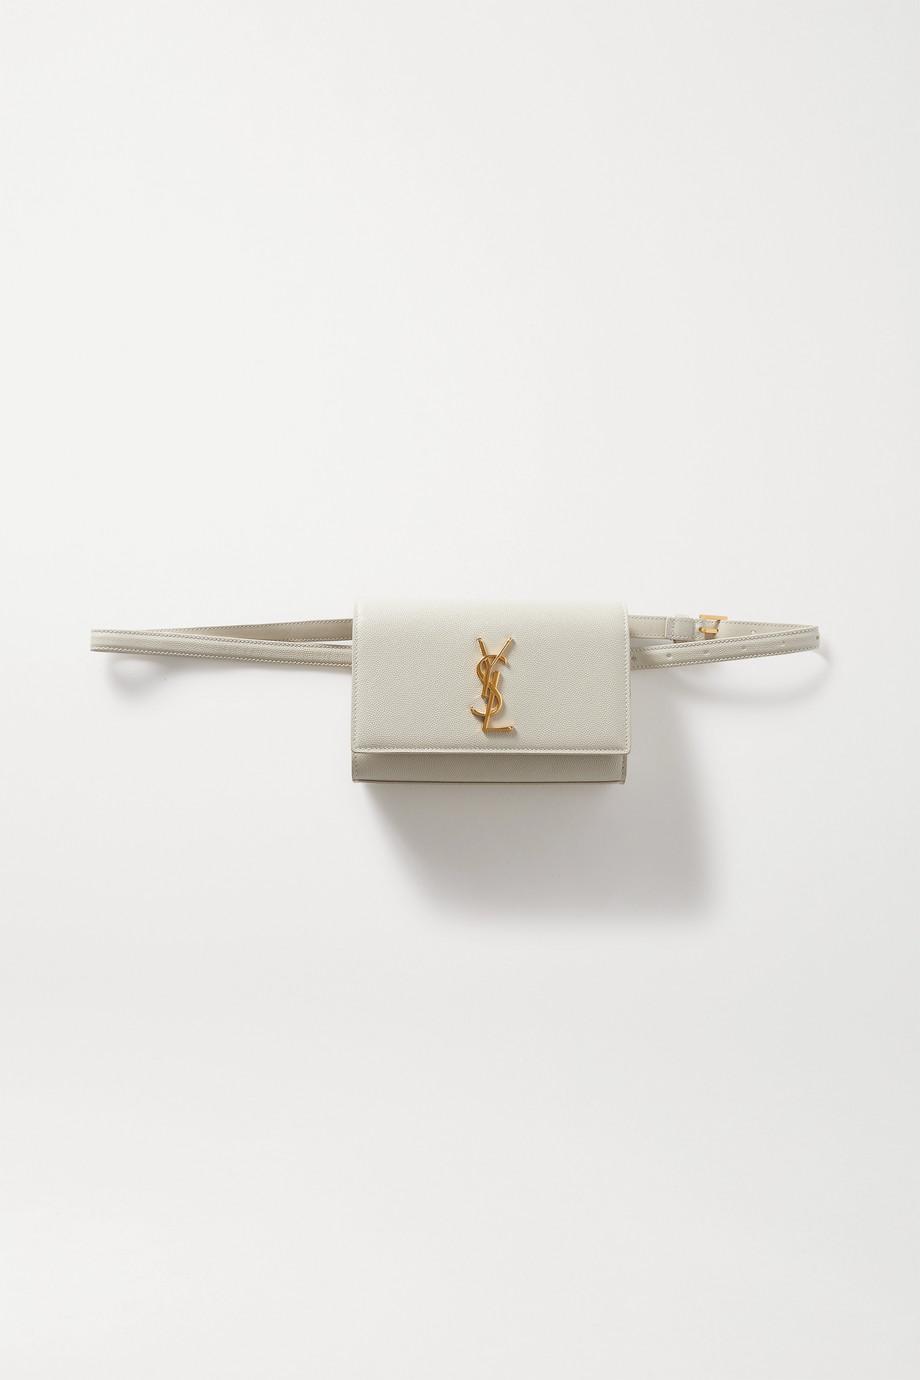 SAINT LAURENT Kate Gürteltasche aus strukturiertem Leder